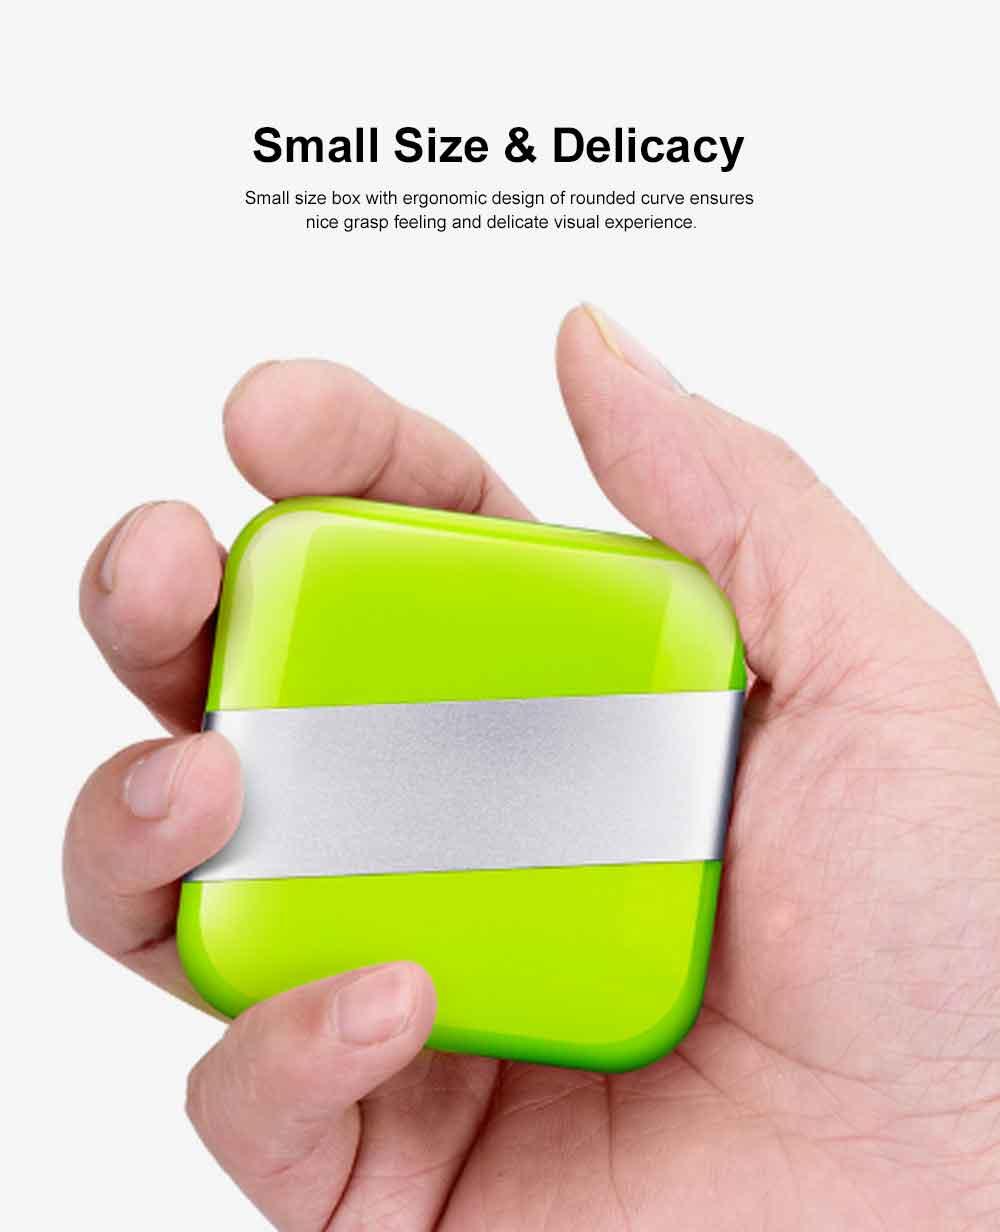 Portable Stylish Mini Medicine Box for Tablets or Pills Separation Put Sealing Anti Humidity Pill Case Shading Medicine Case 4